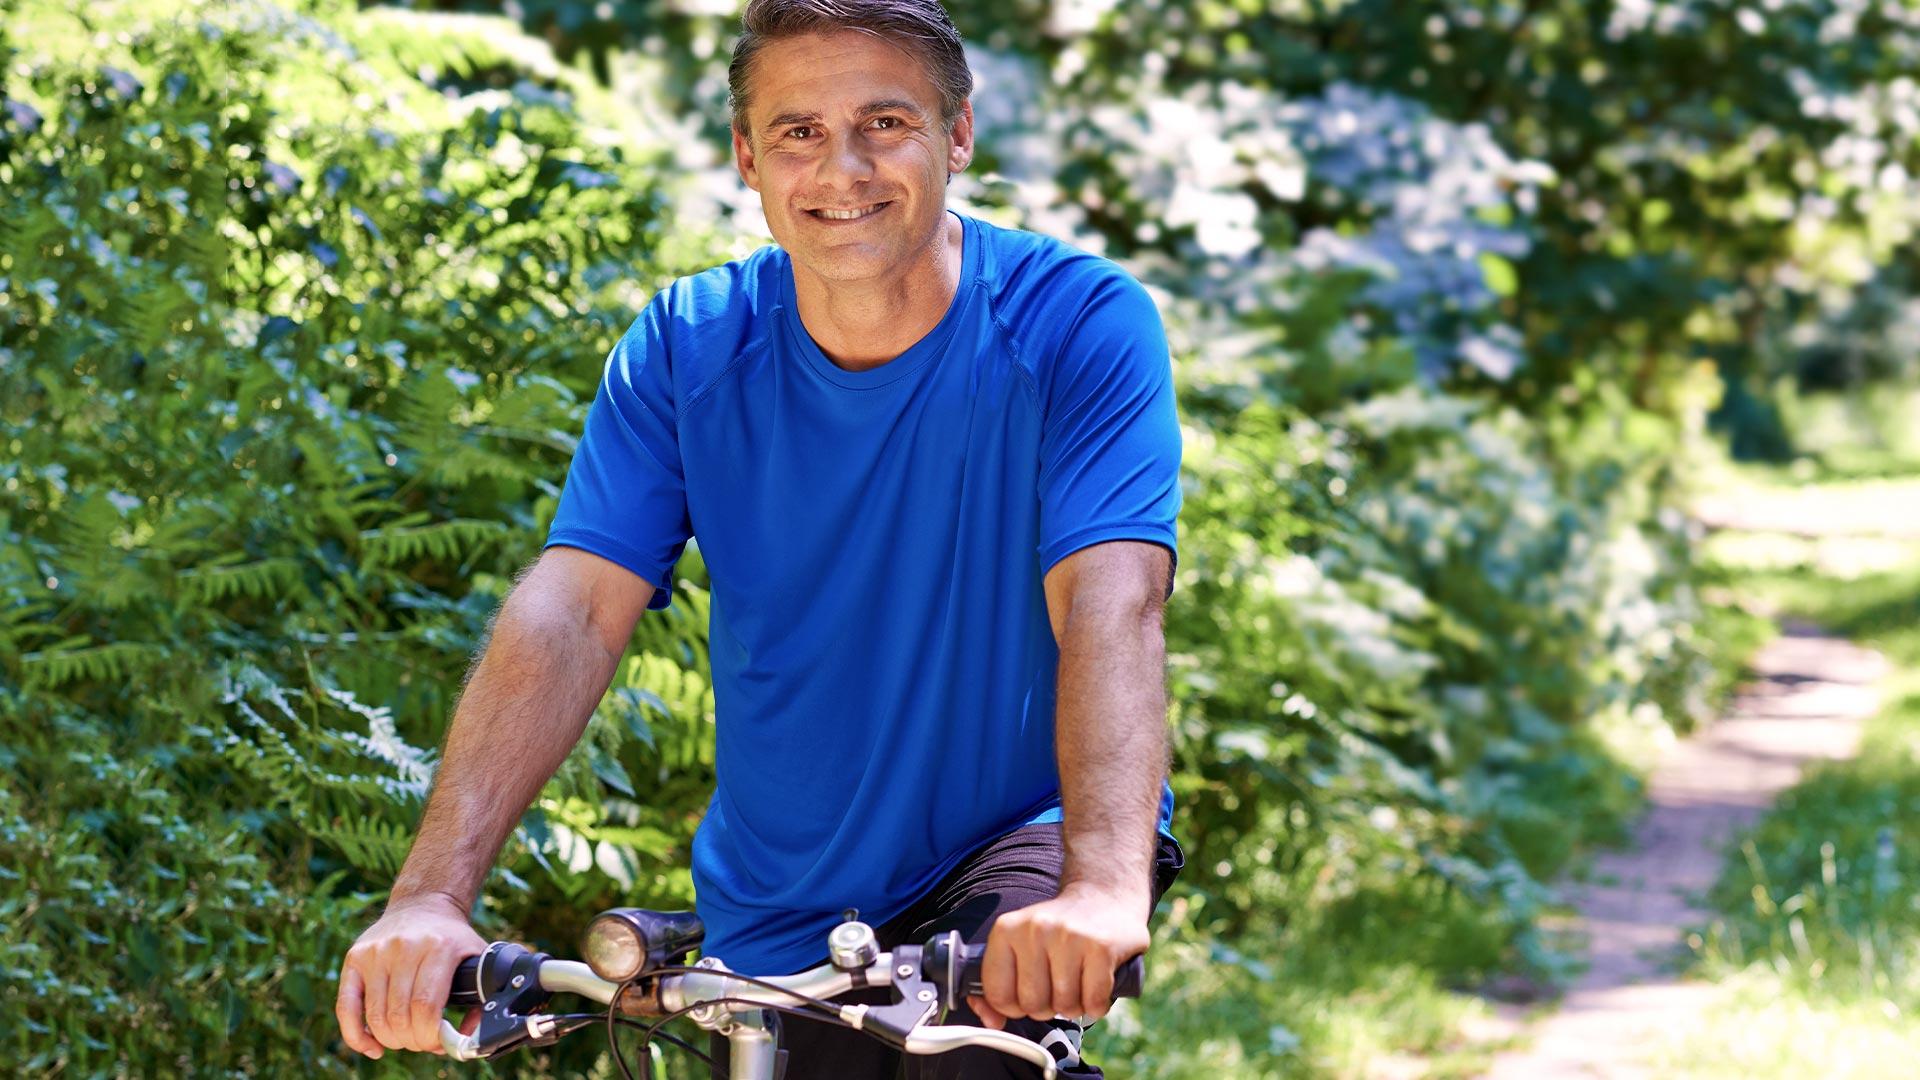 Man riding bike with blue shirt on path